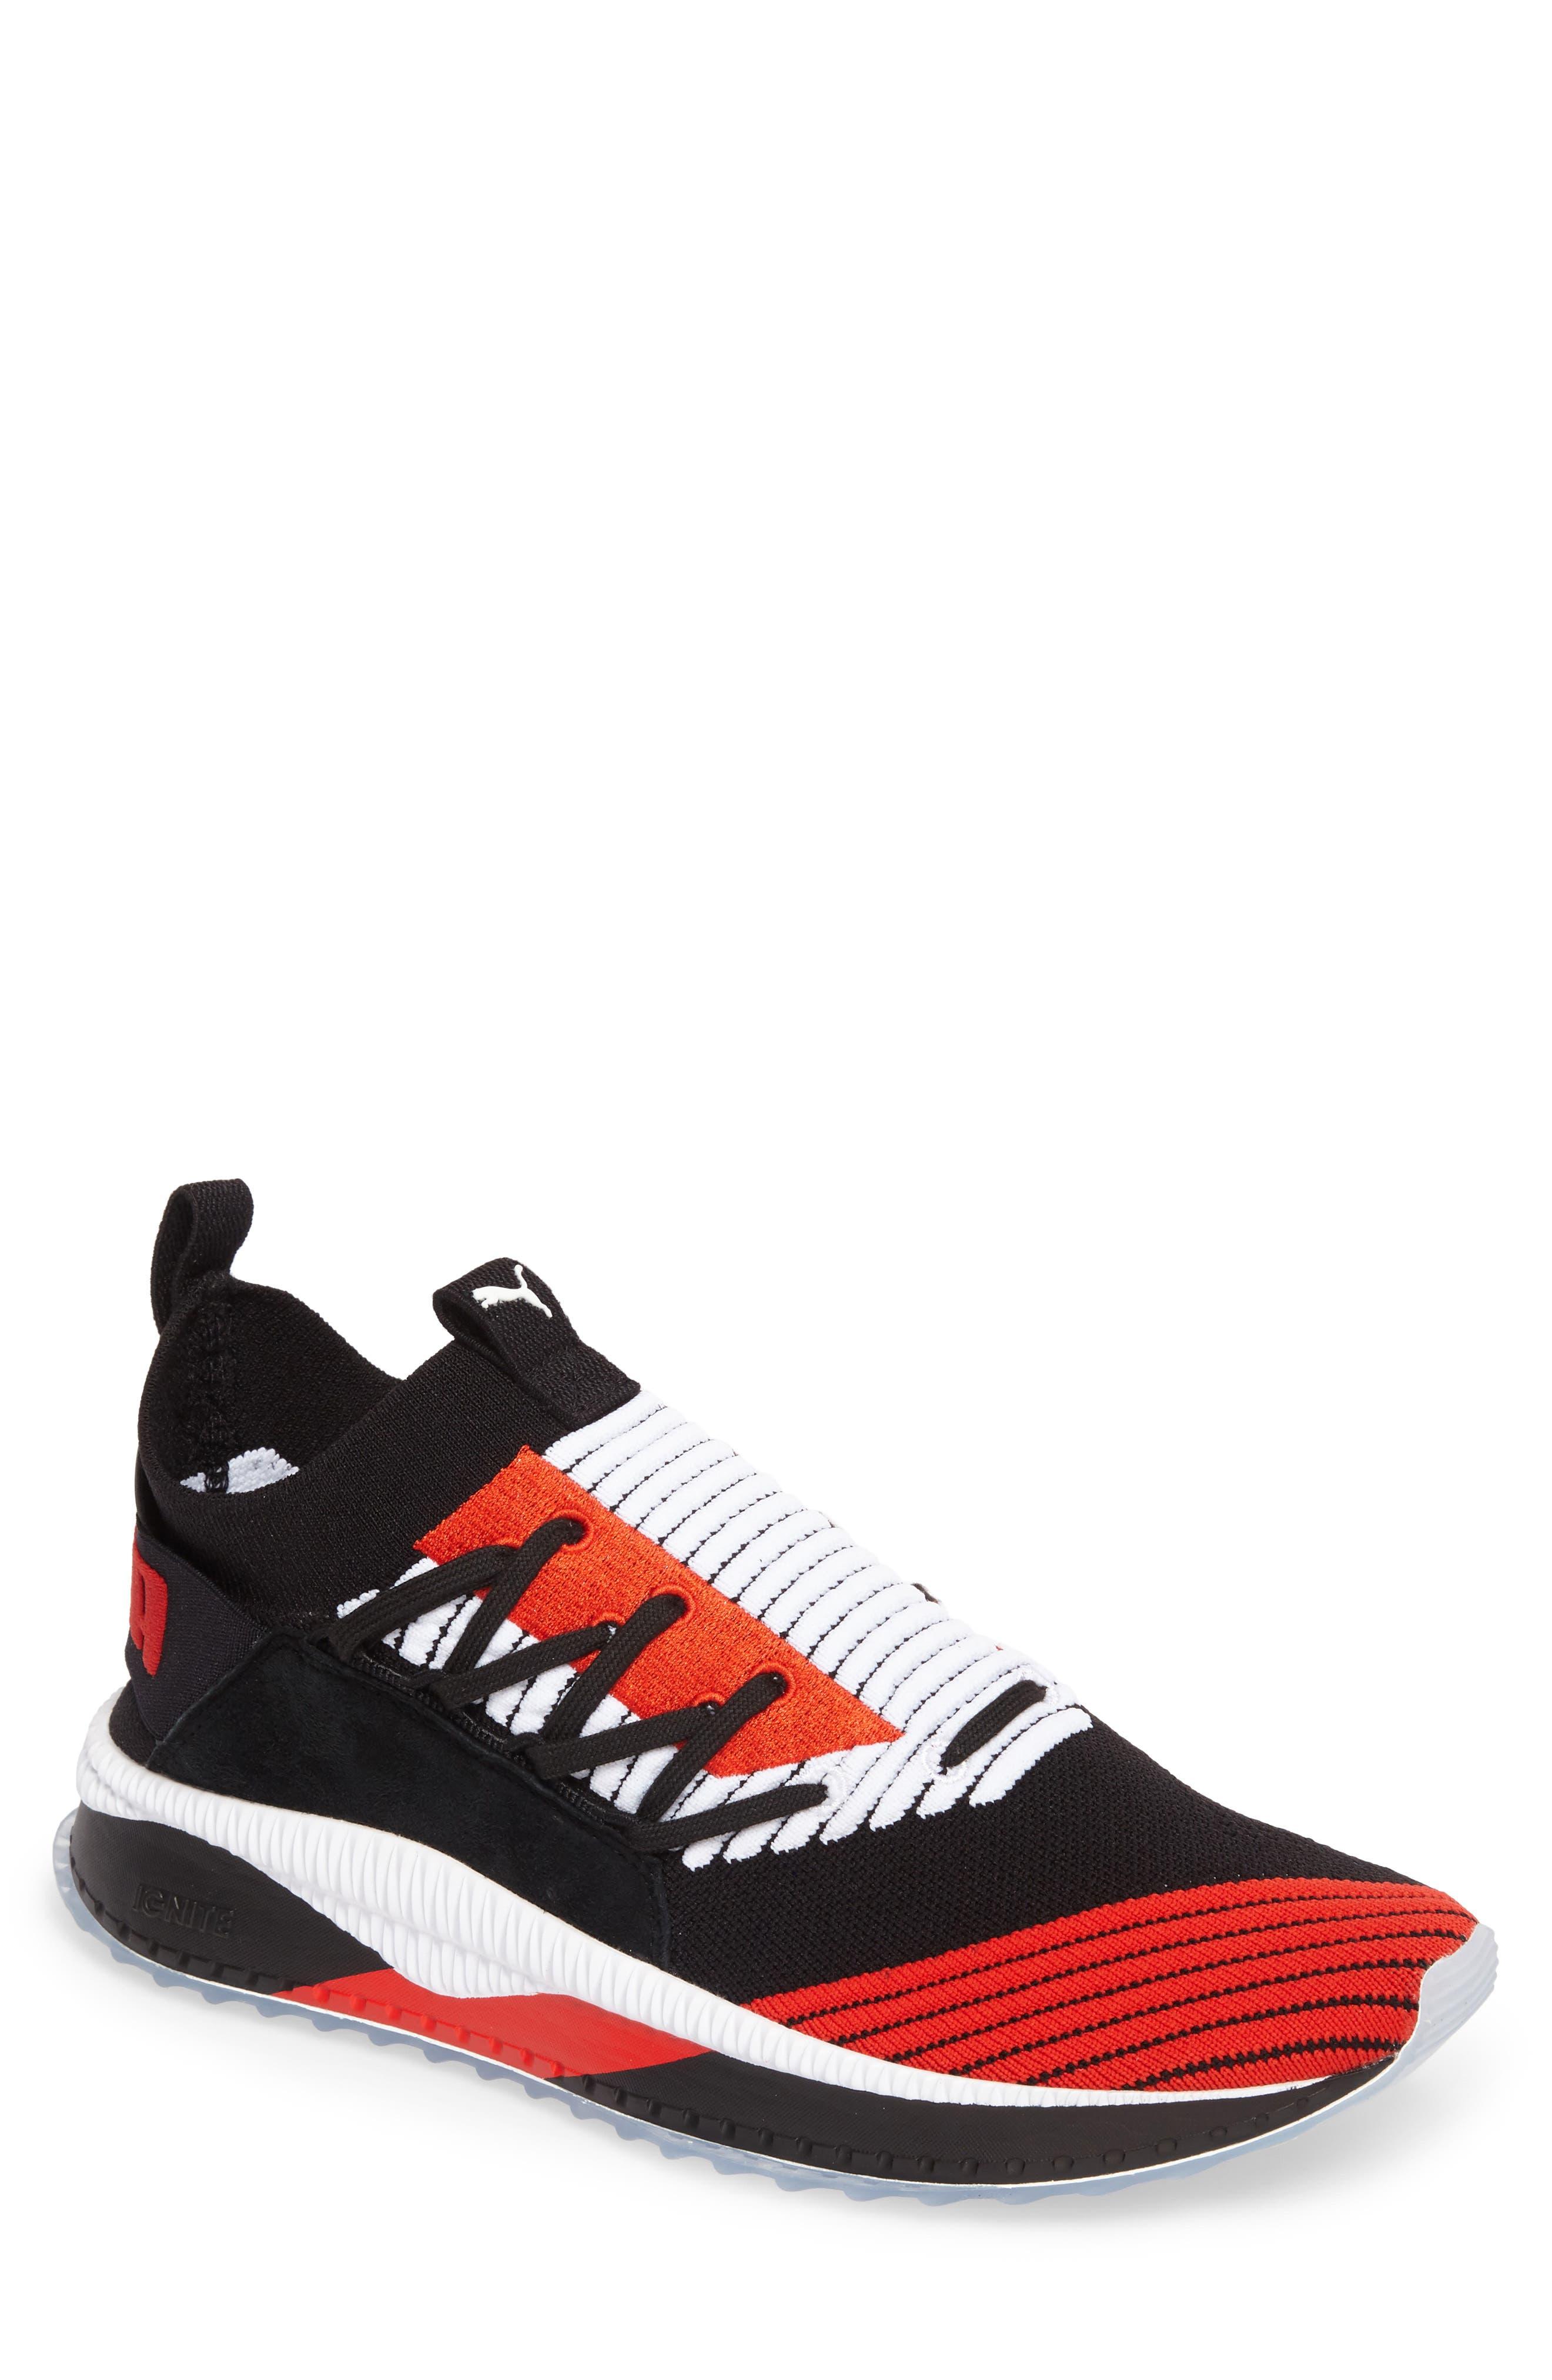 Tsugi Shinsei UT Odyssey Sneaker,                         Main,                         color, 010